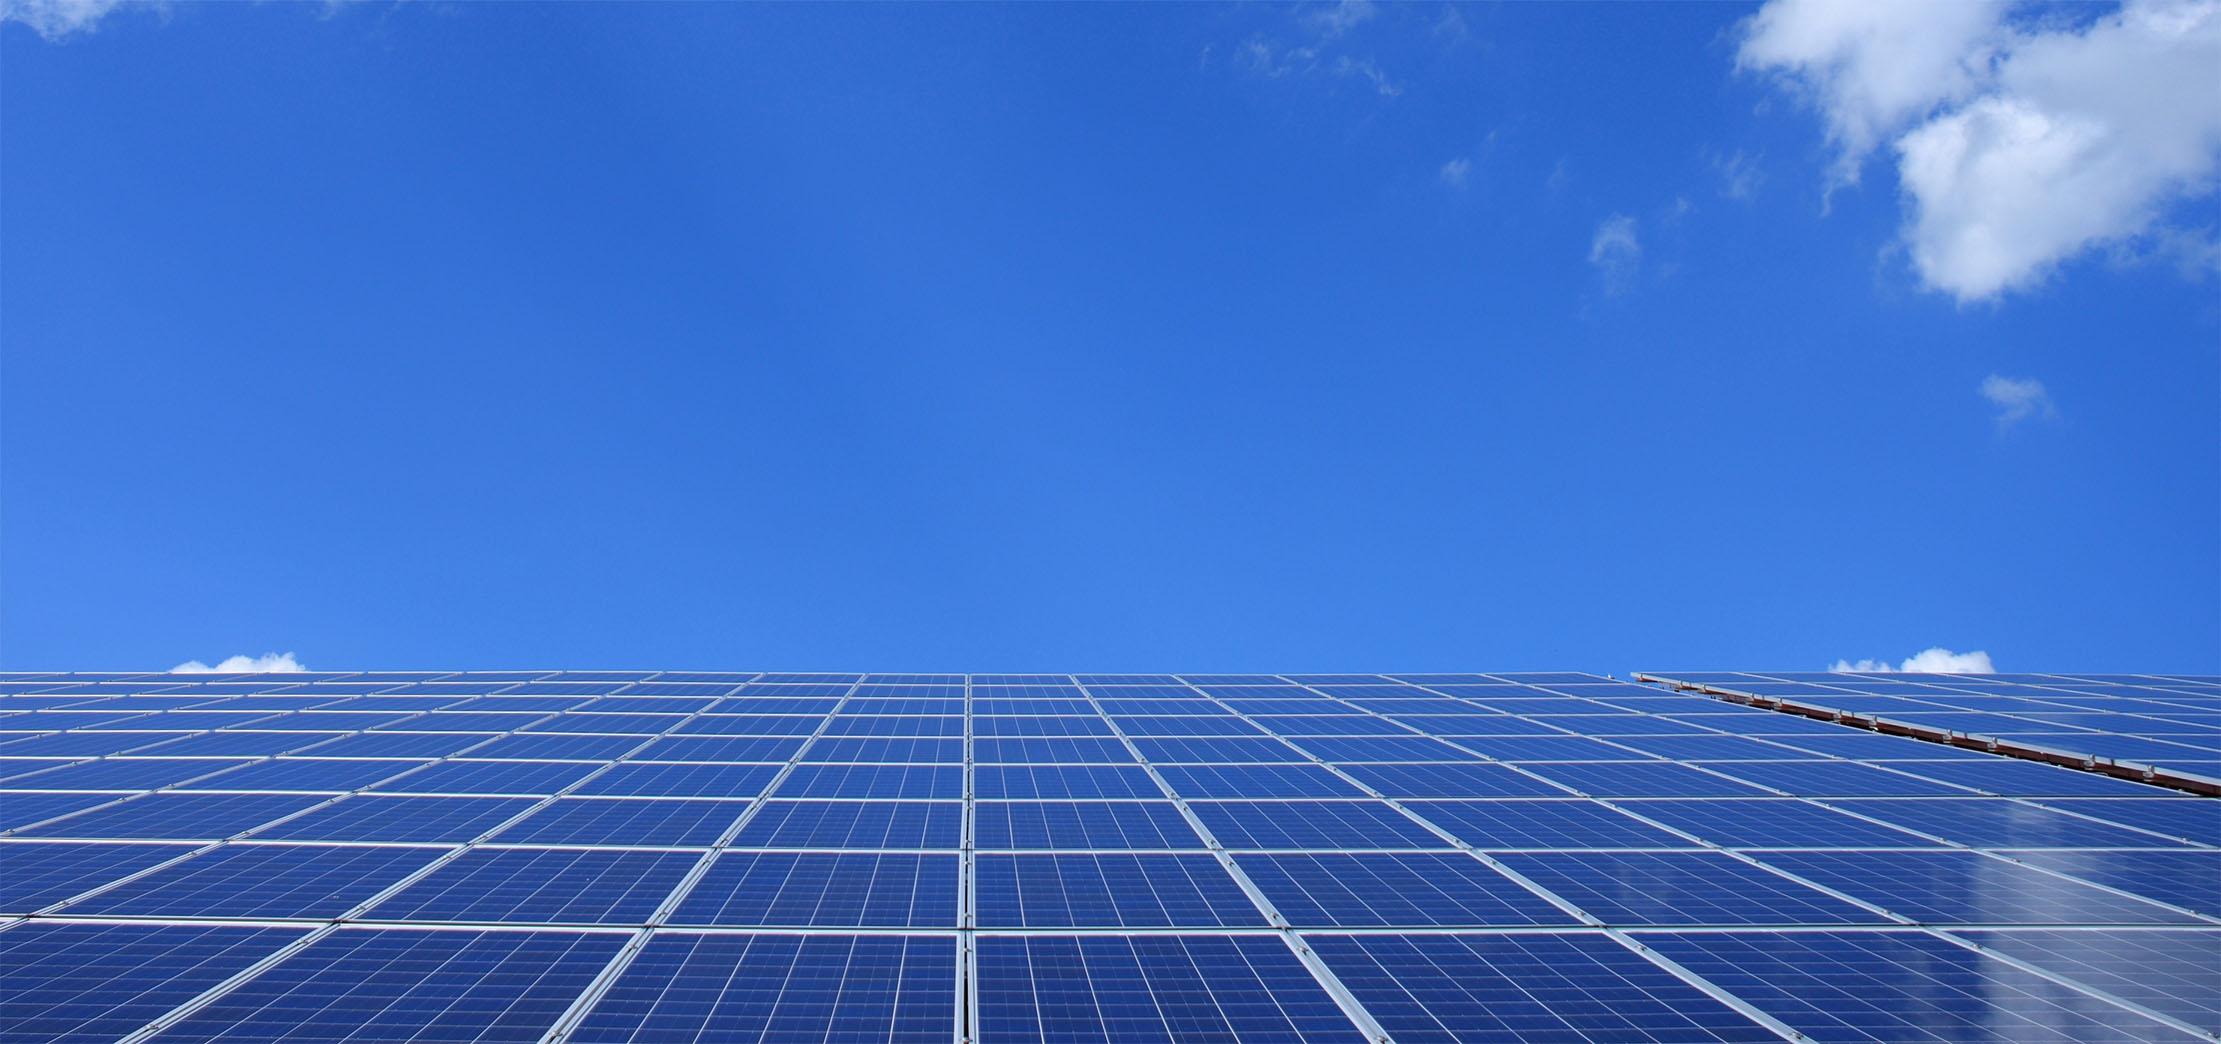 solar panel seamless